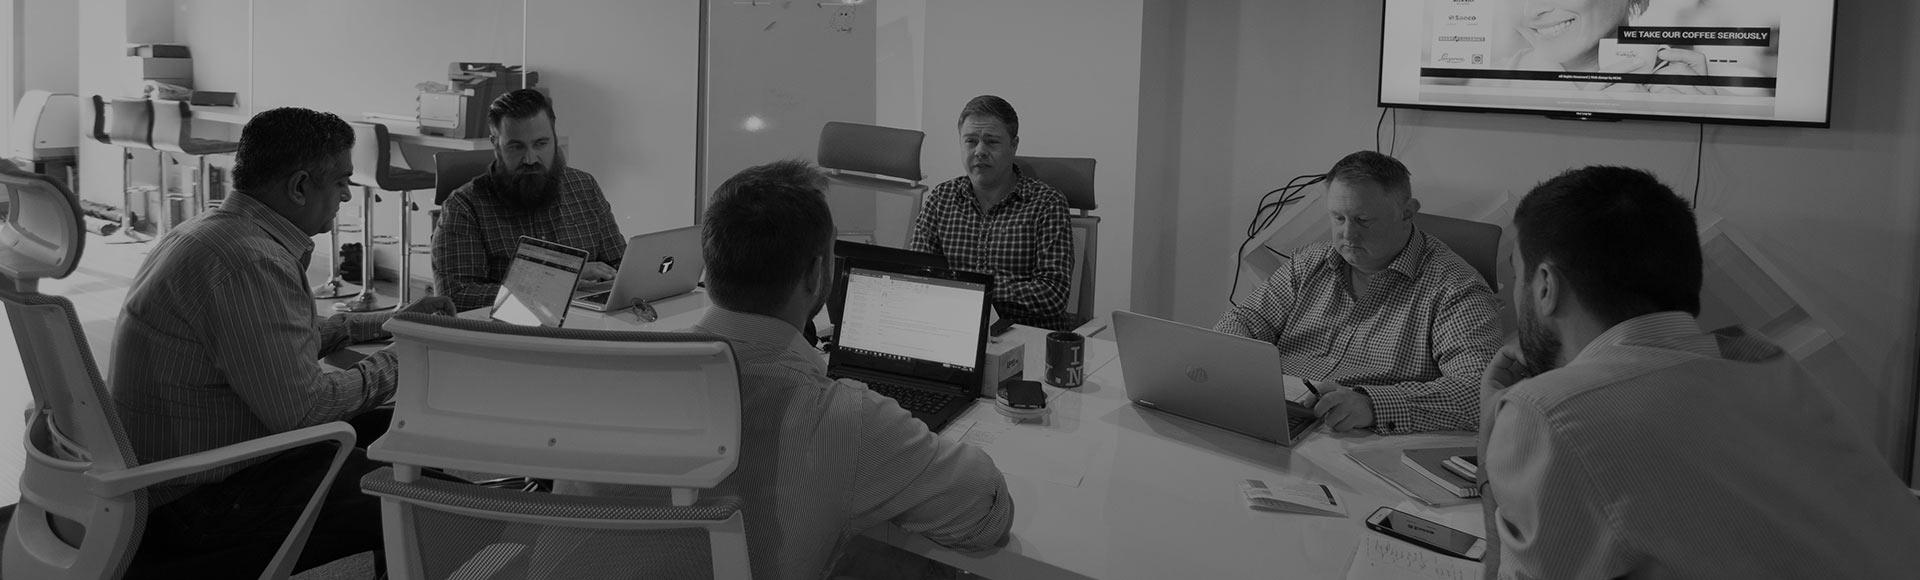 About Nexa, Dubai's leading Digital Marketing Agency